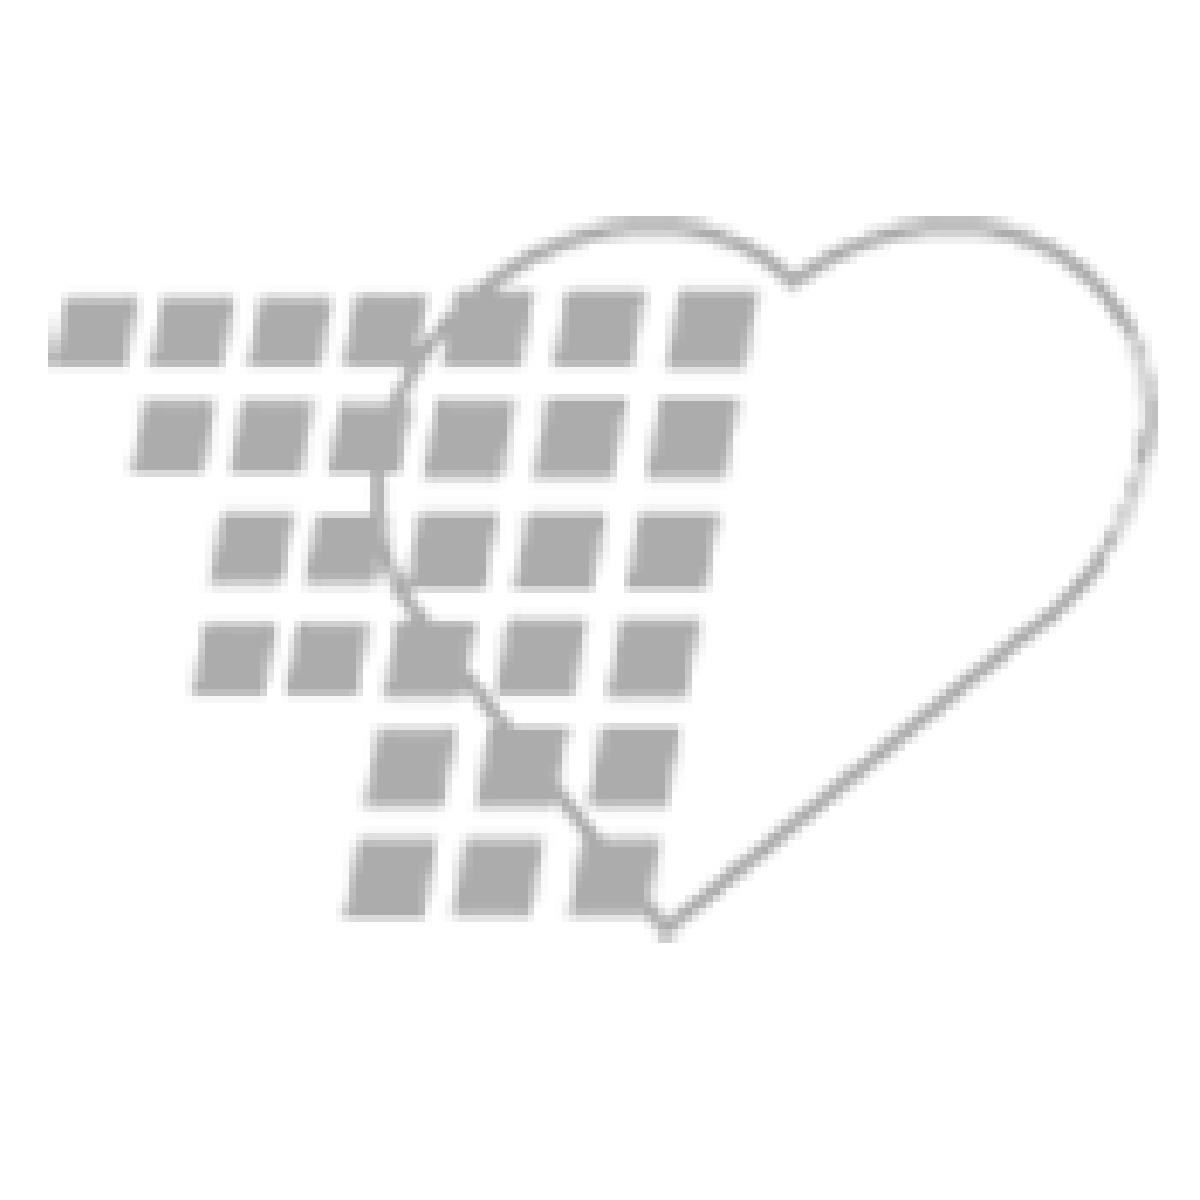 09-79-5455 - Delmar's Intermediate Nursing Skills DVD Set (9-16) Non-Returnable